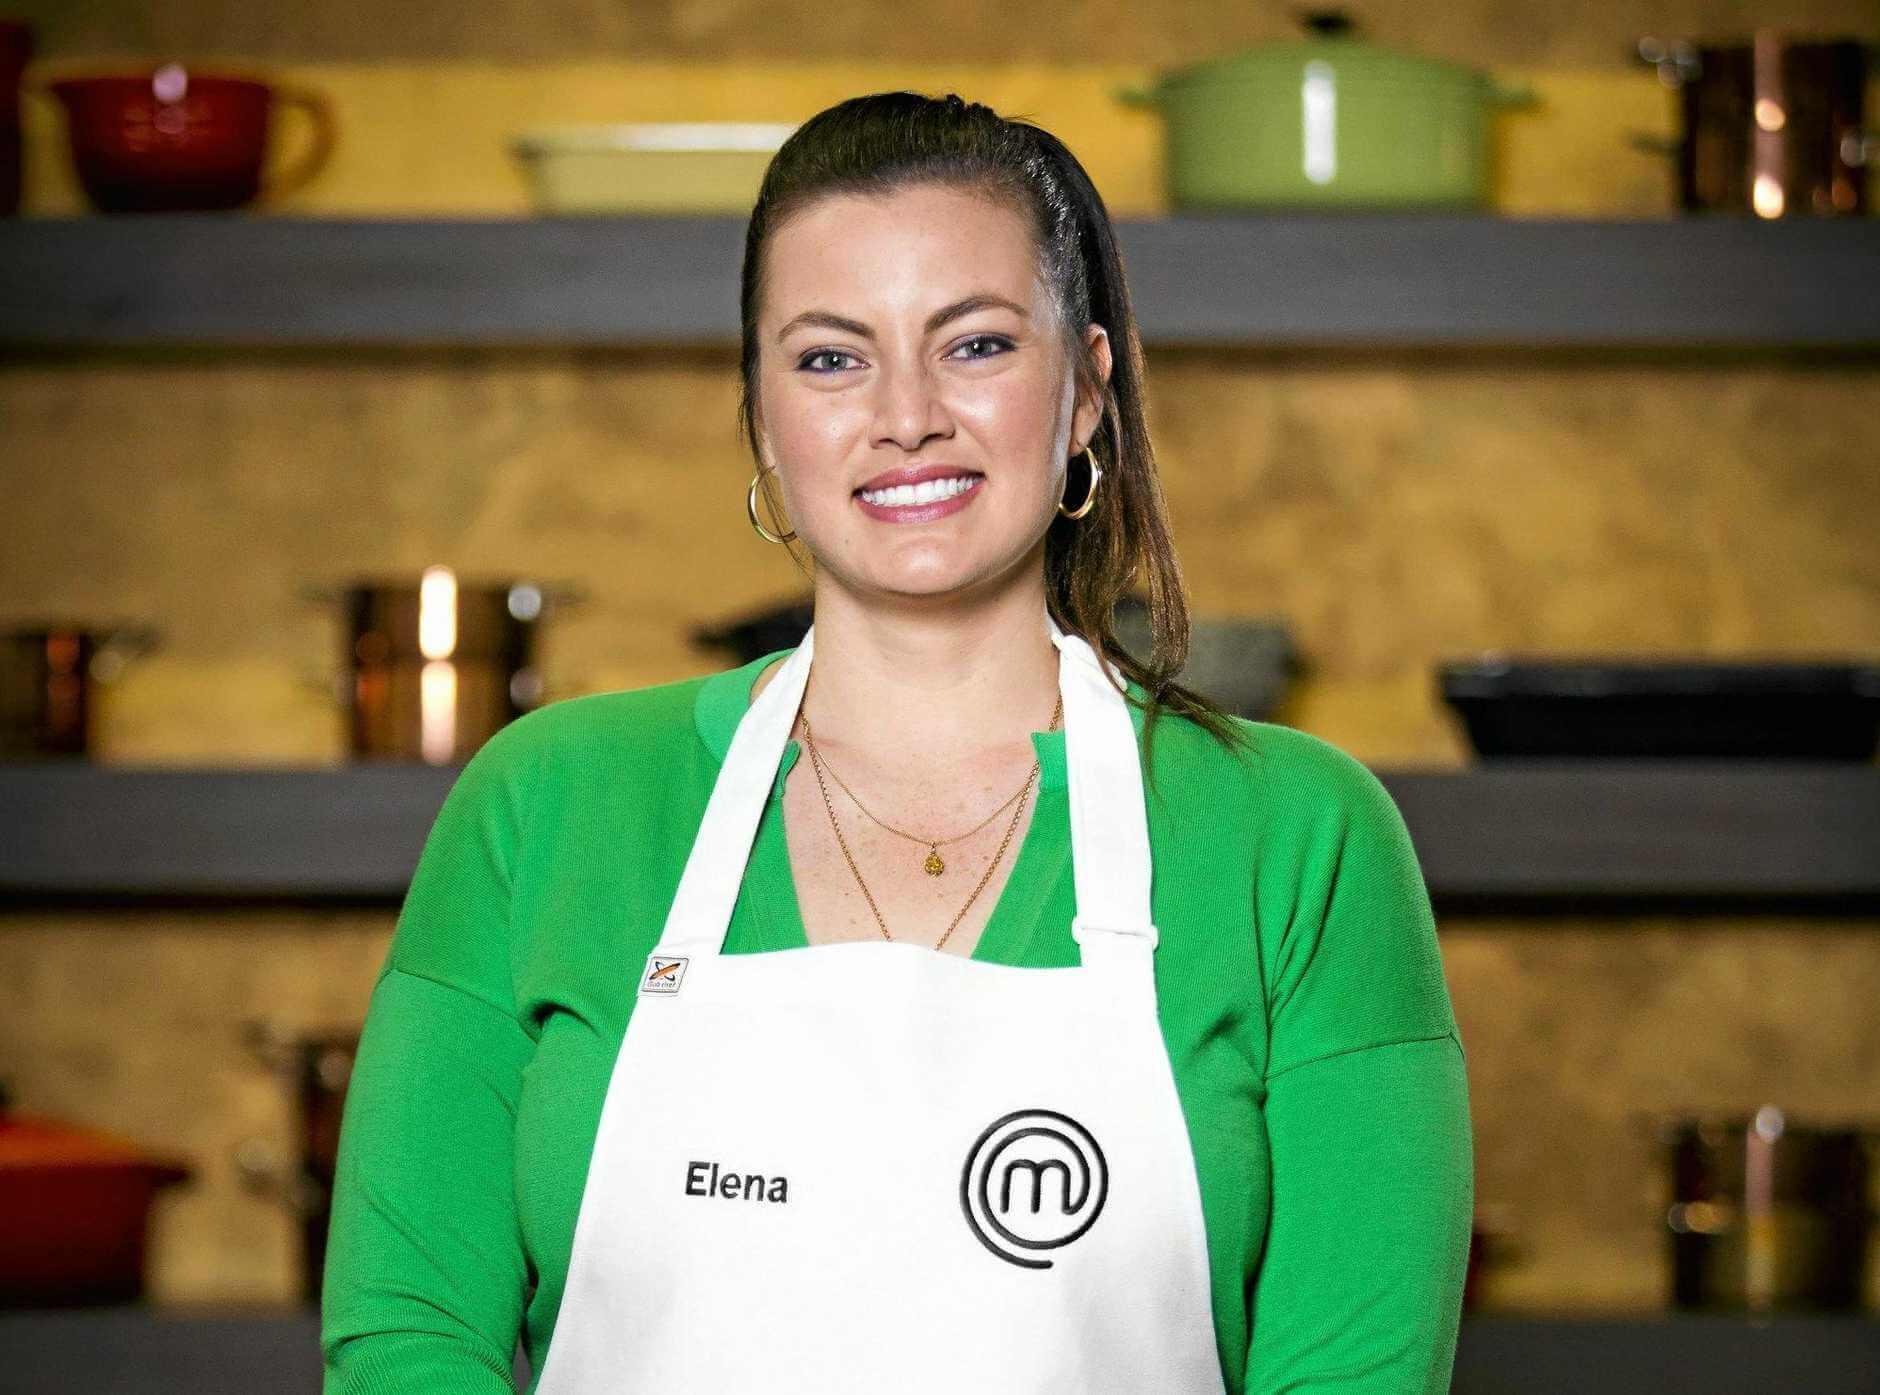 Elena Duggan